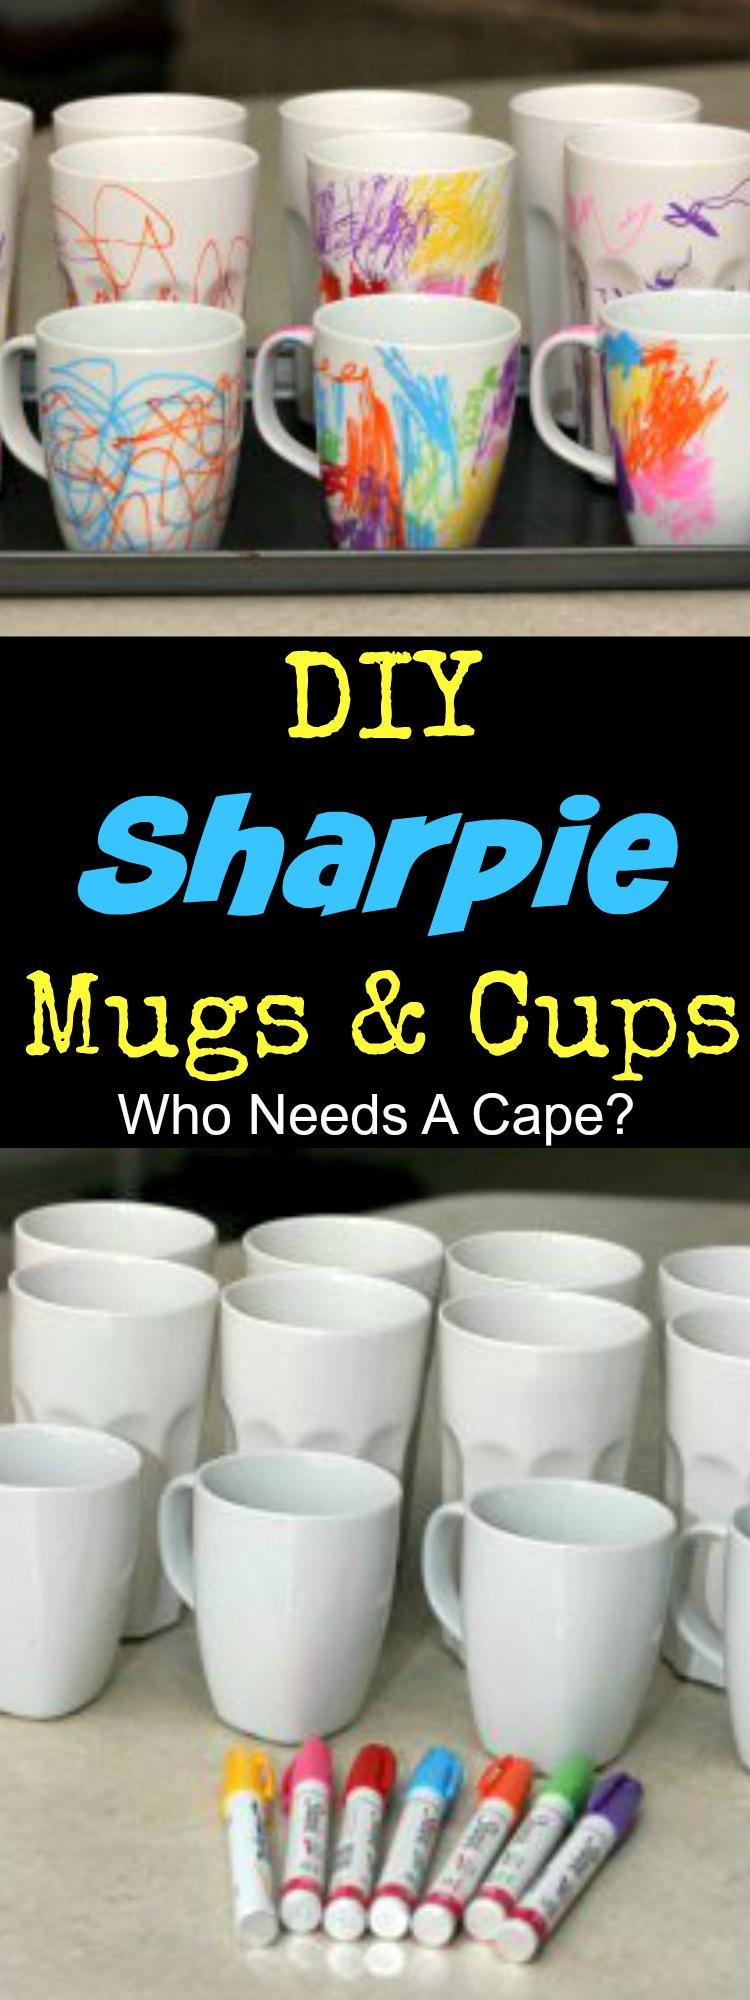 DIY Sharpie Mugs Cups Collage